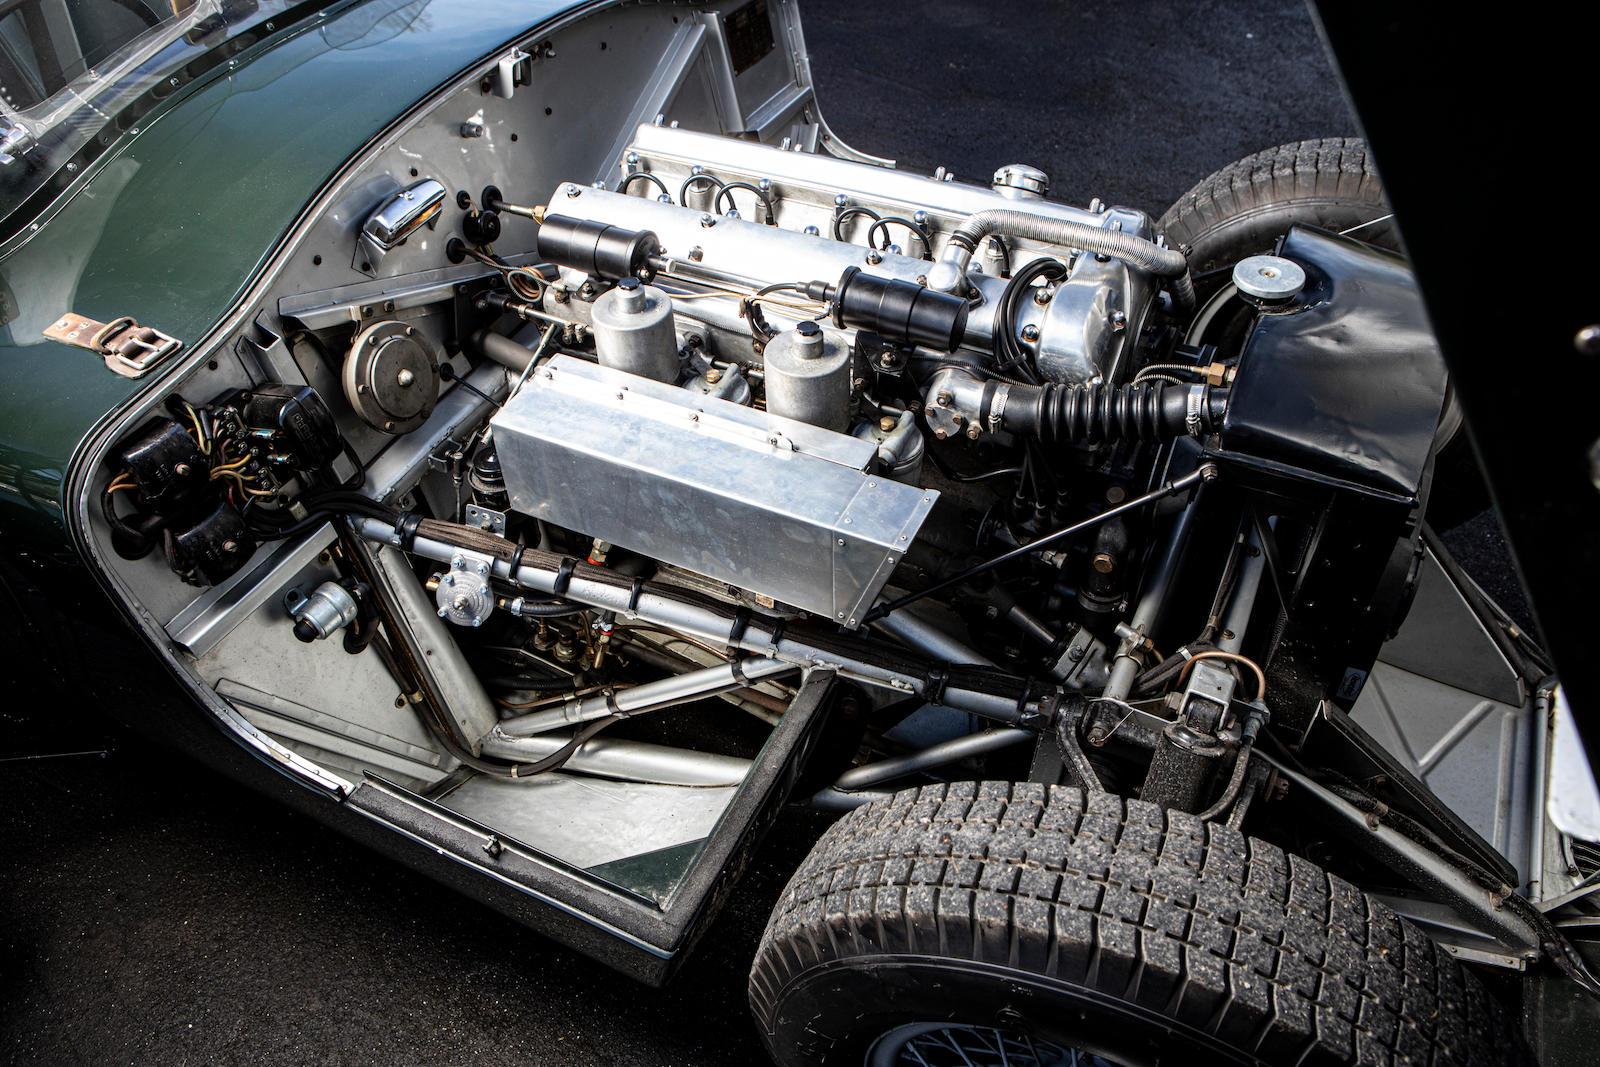 1952 Jaguar XK120 C-Type engine